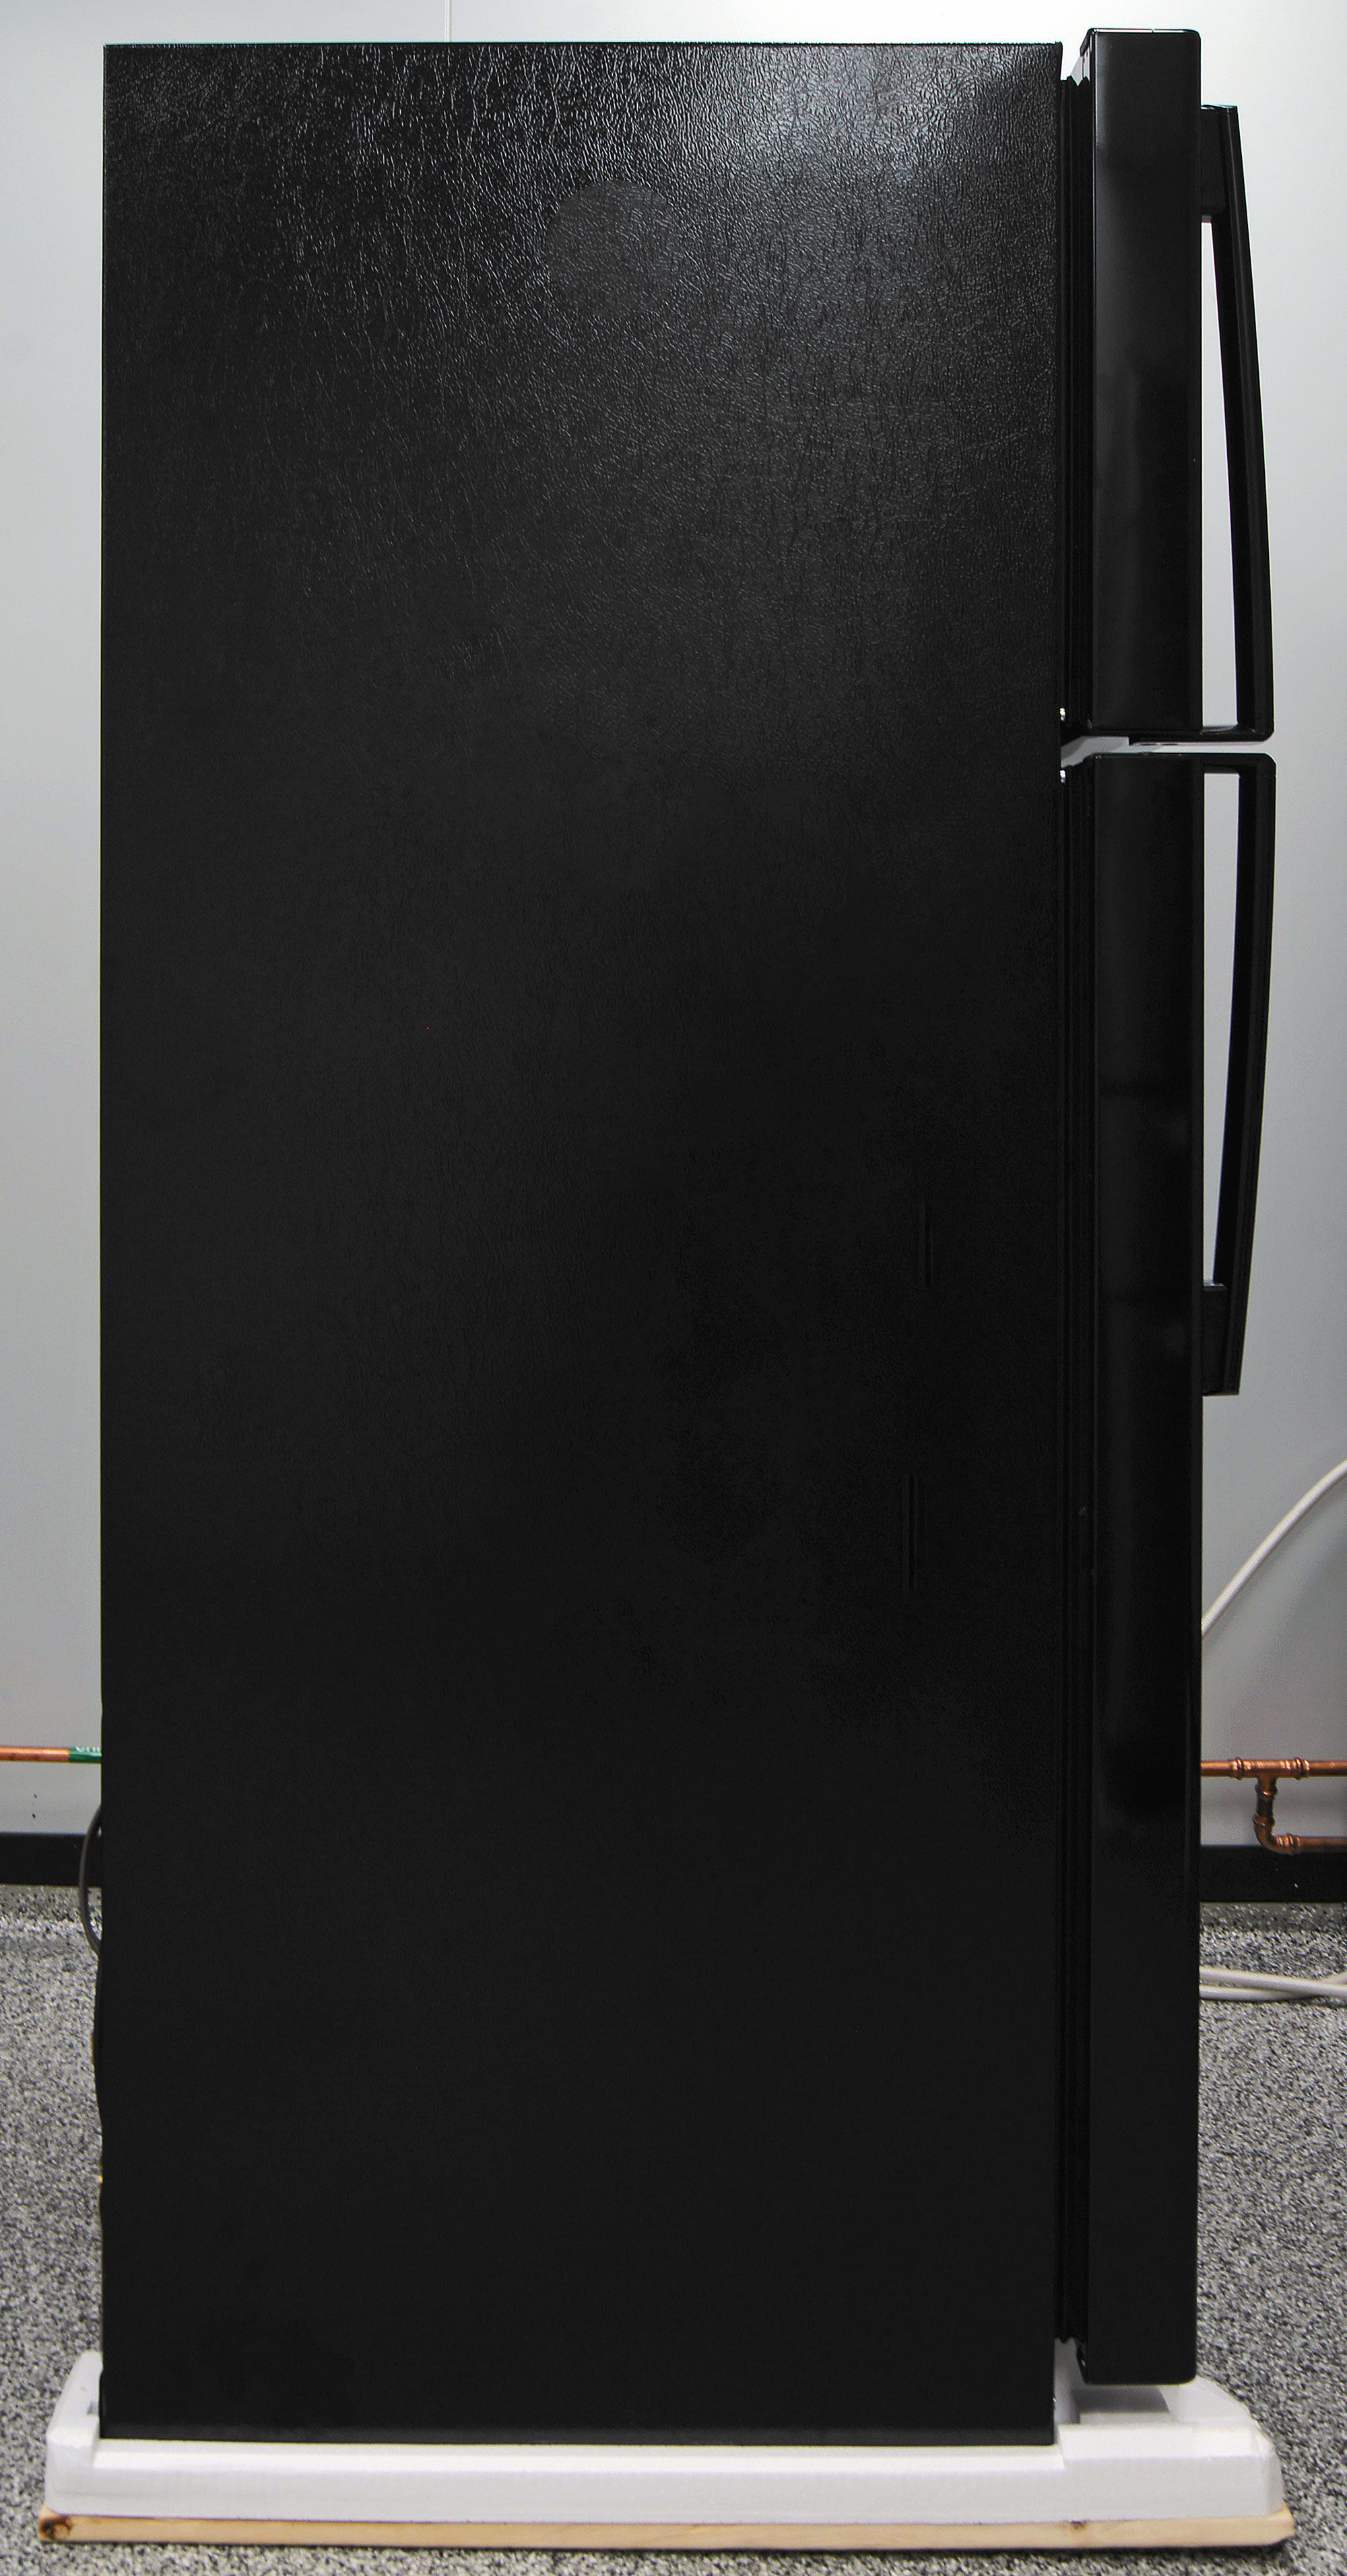 Black matte sides complement the GE GIE16DGHBB's glossy black front.